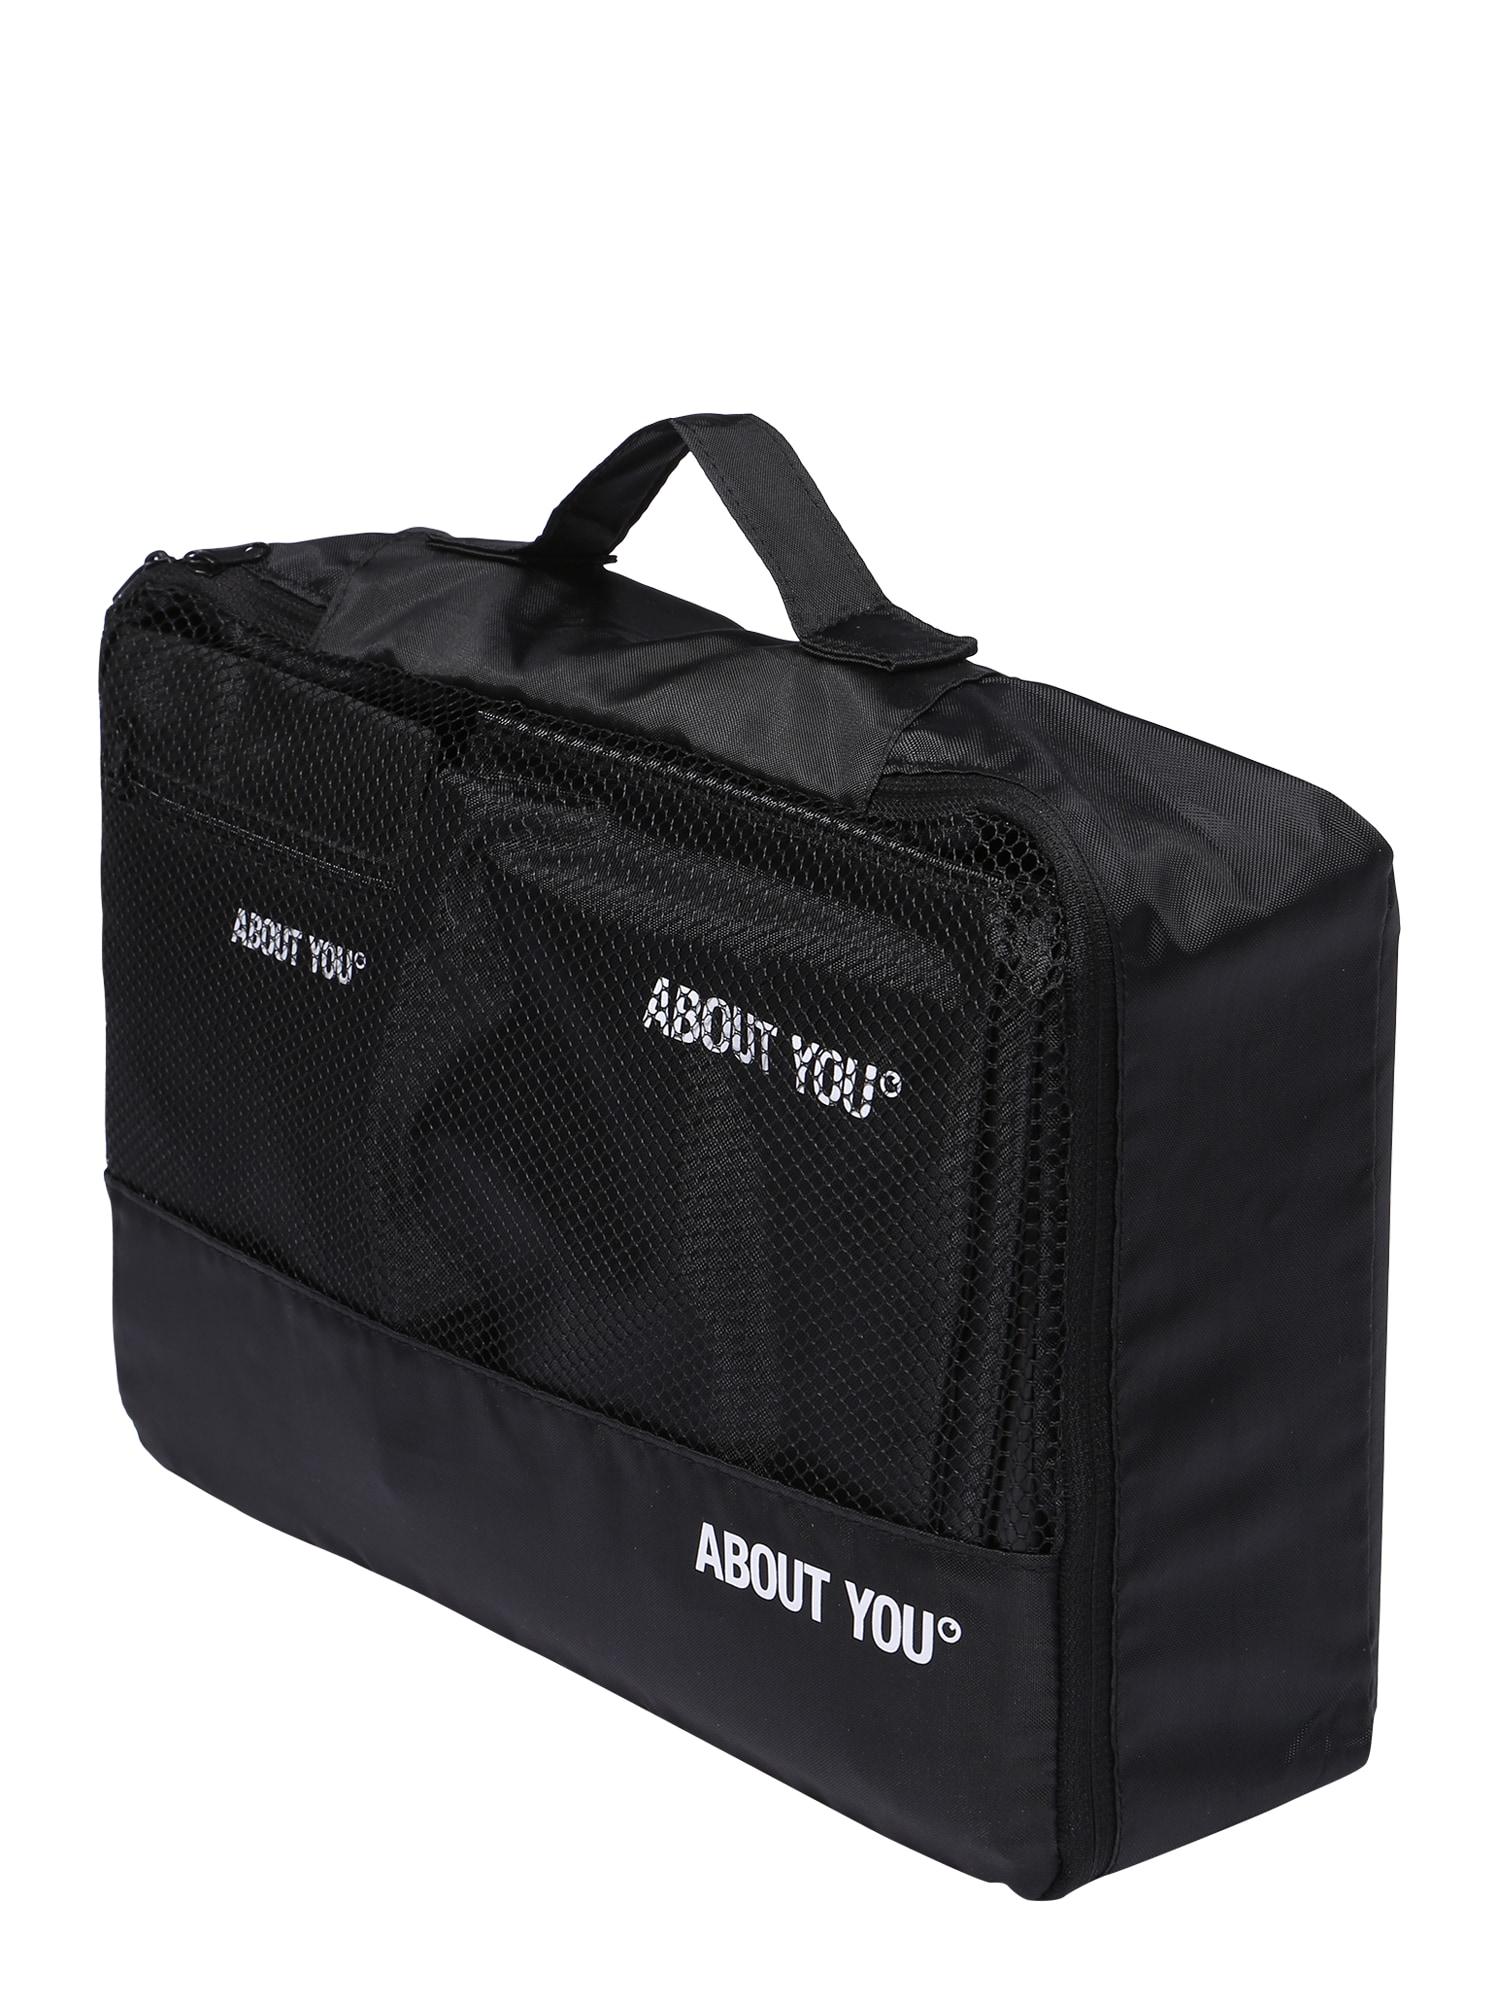 ABOUT YOU Kelioninis krepšys 'Reise-Set' juoda